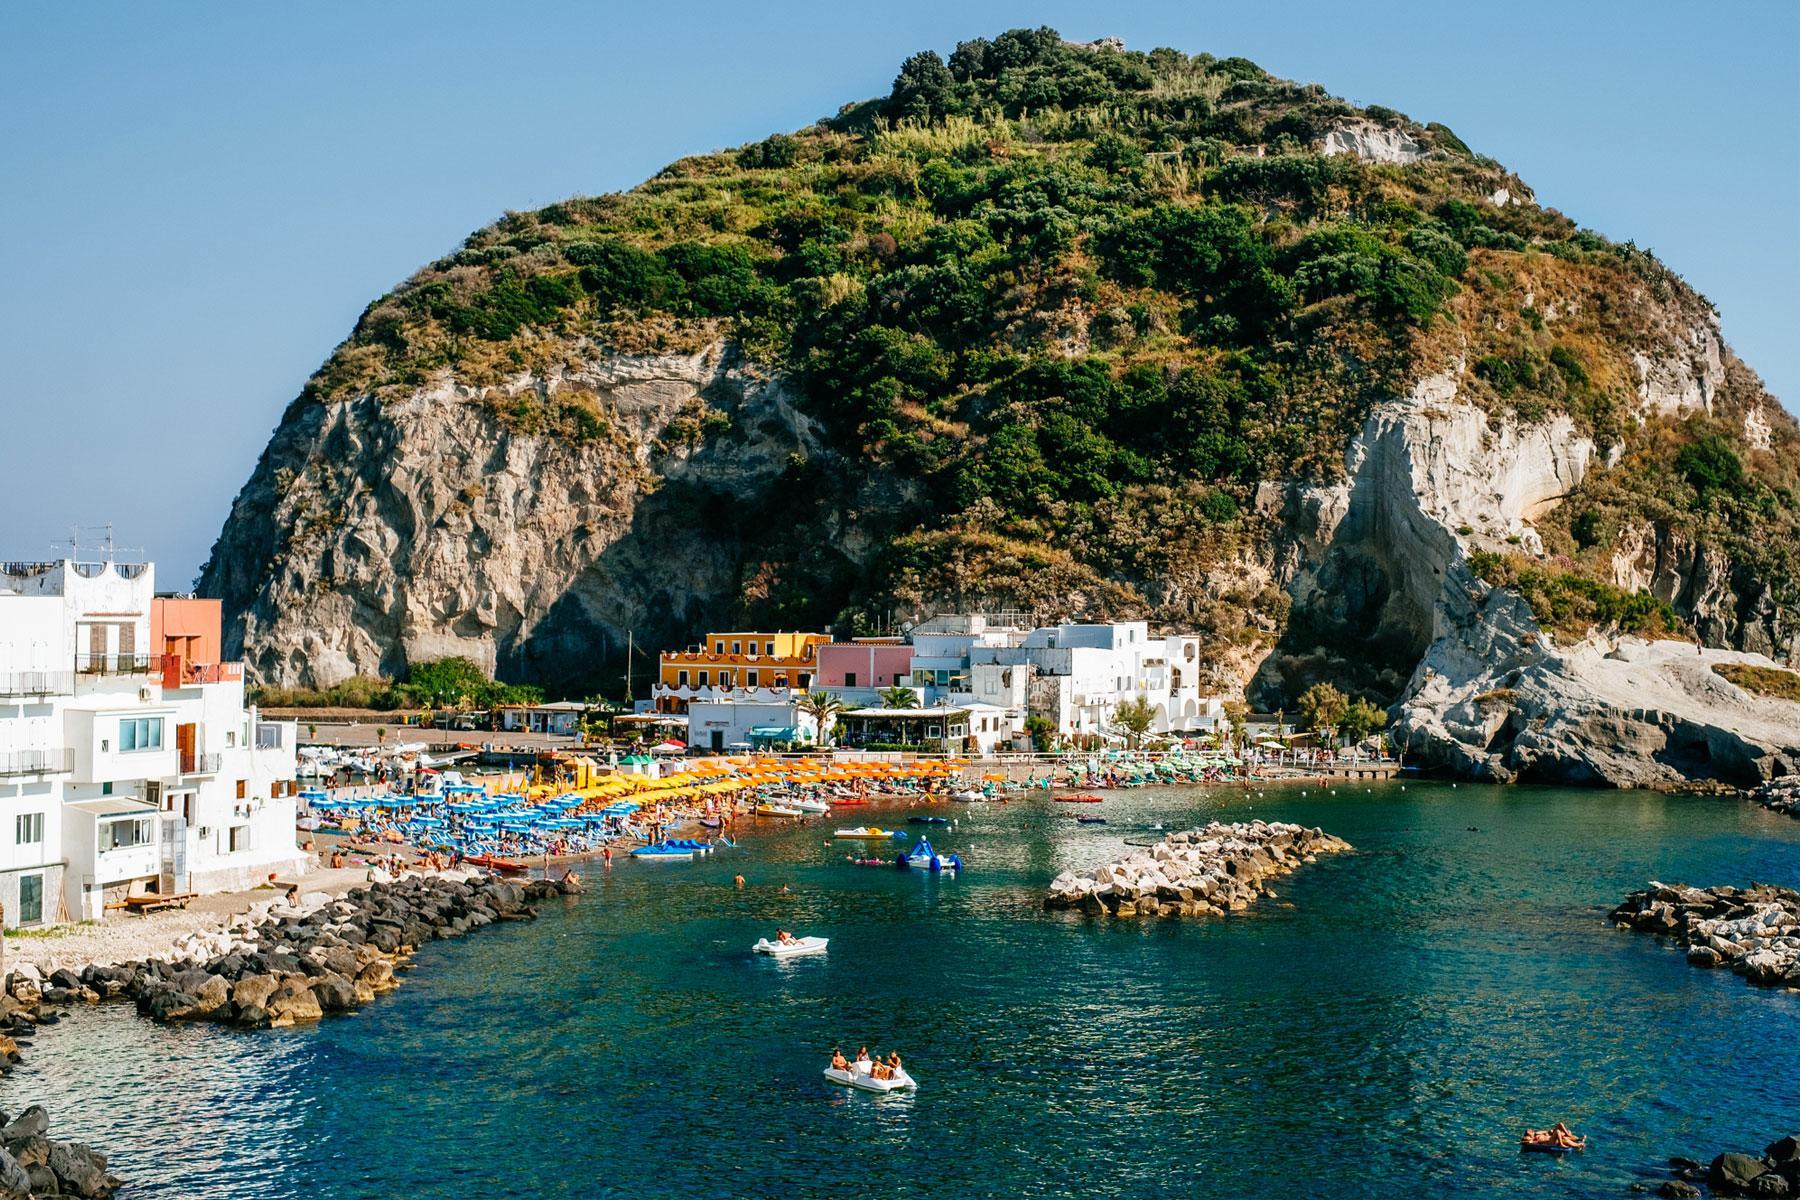 How To Spend 3 Days In Ischia Italy